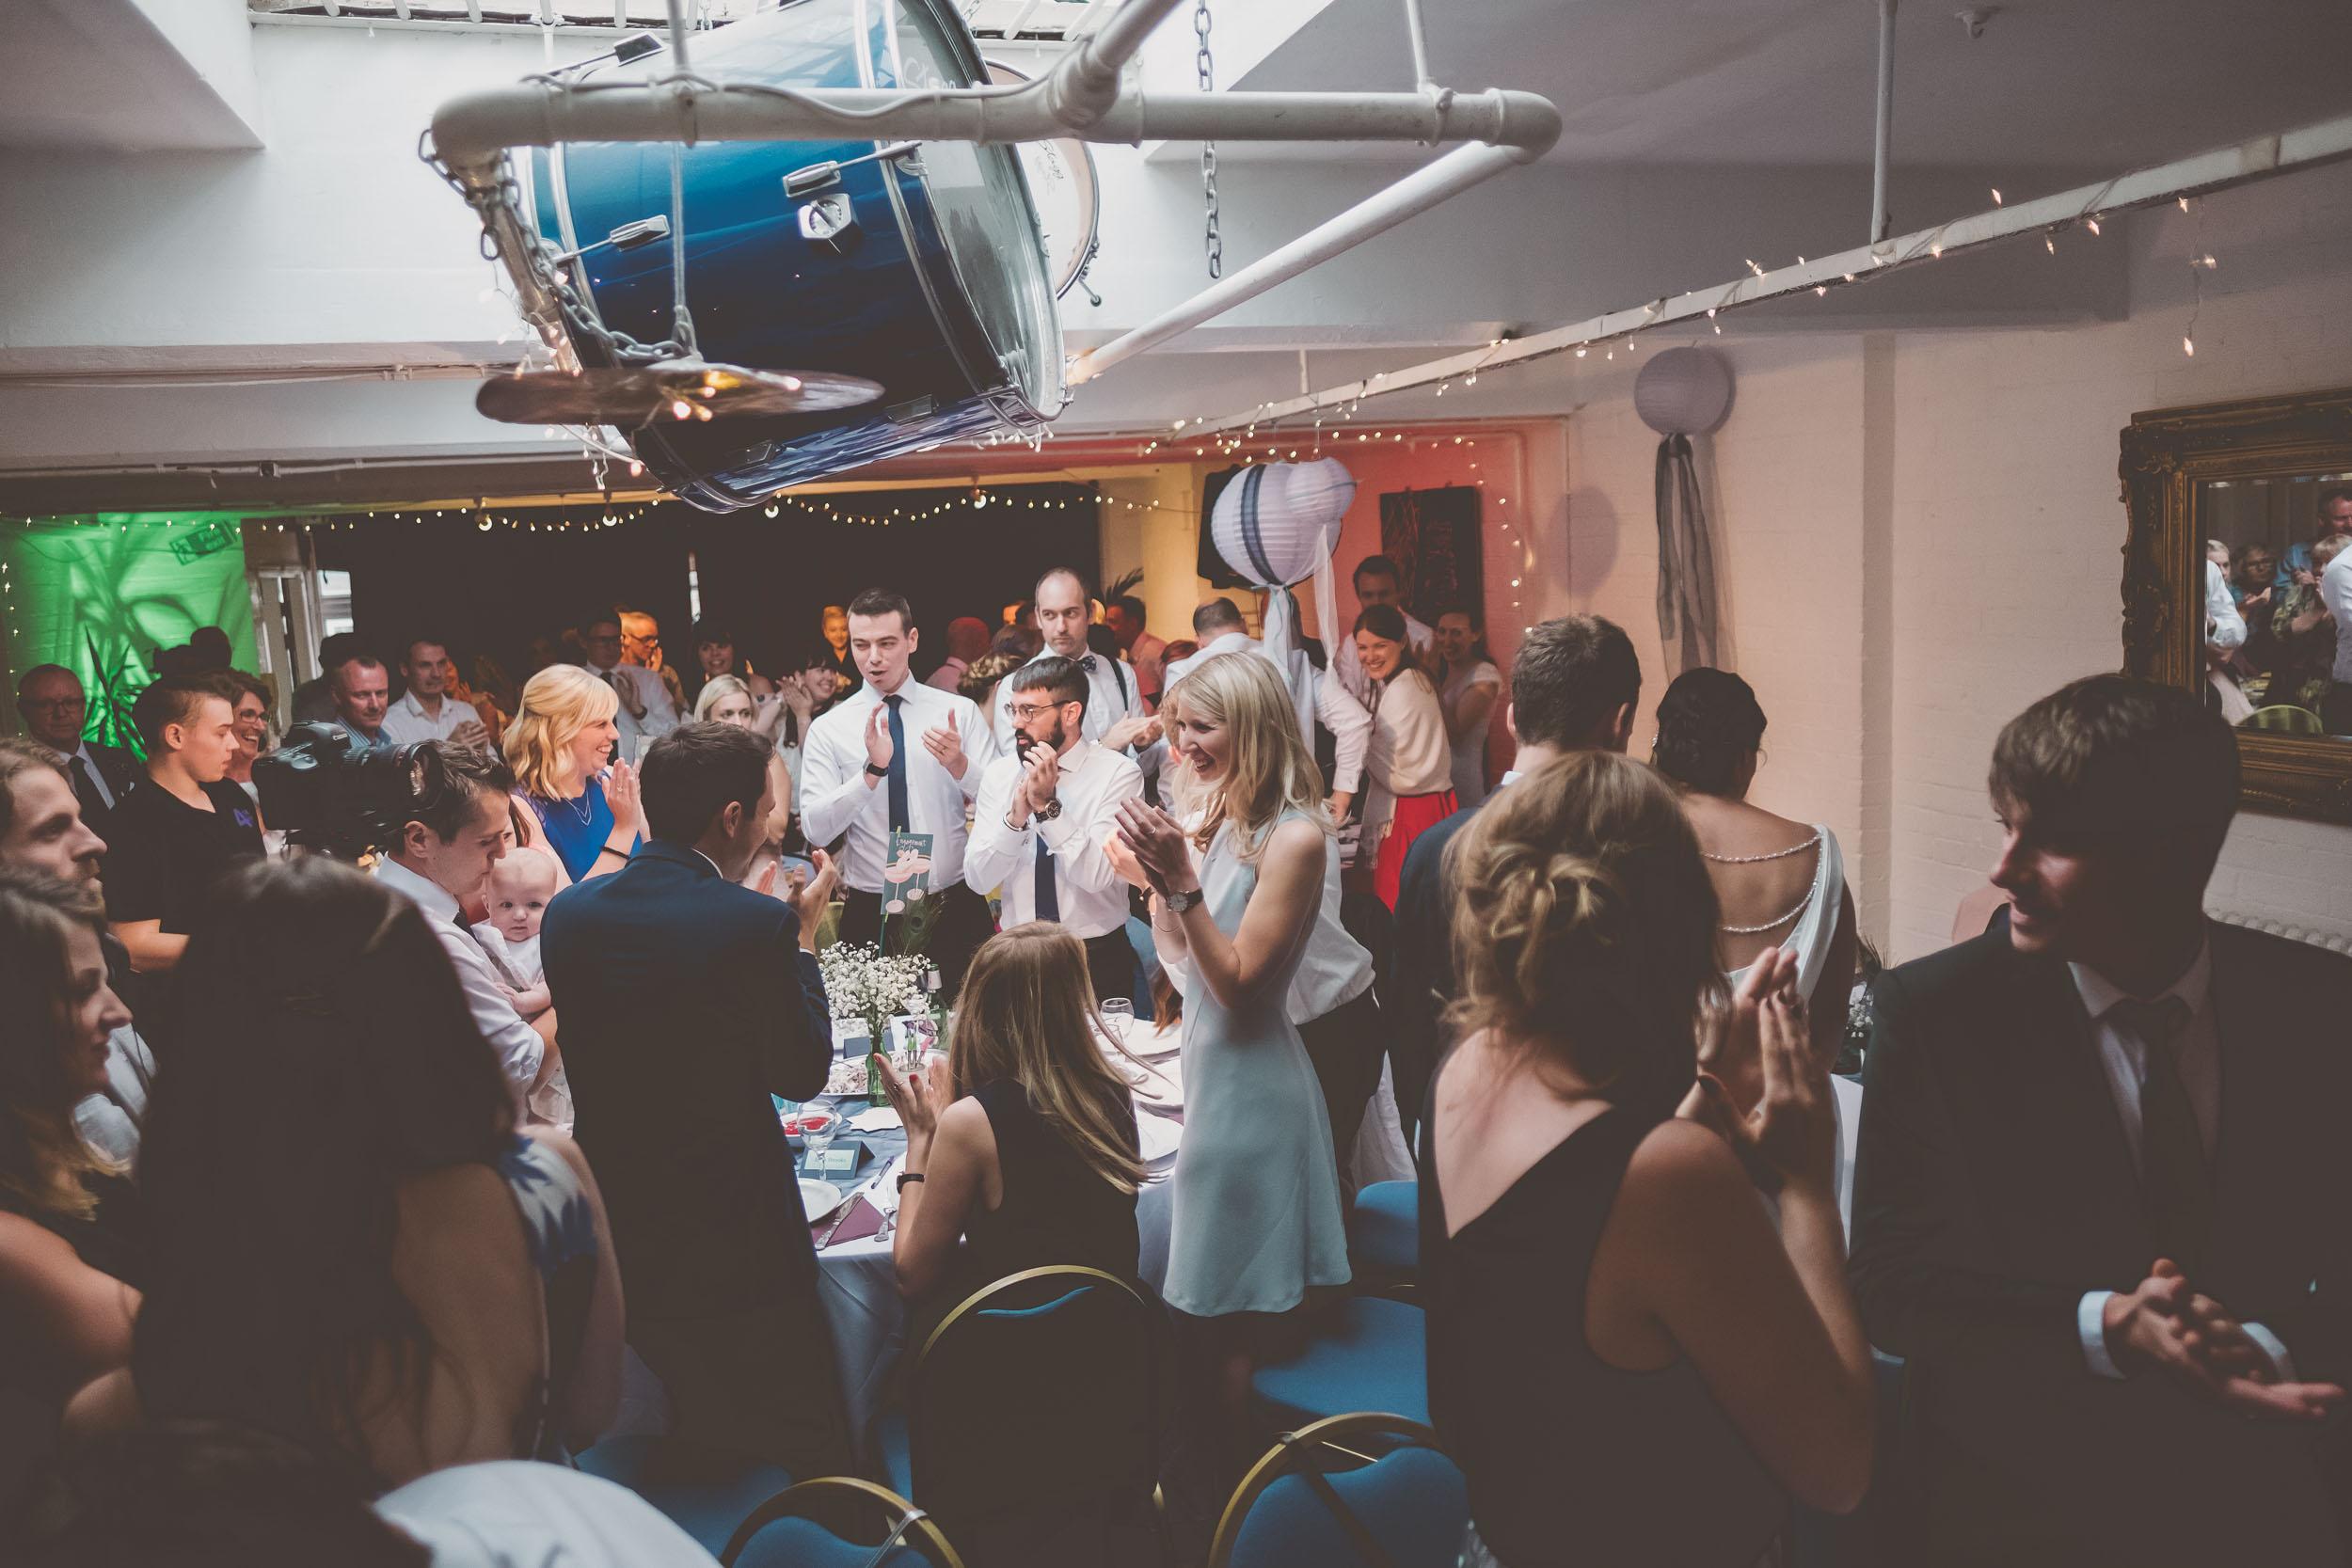 islington-town-hall-4th-floor-studios-wedding347.jpg